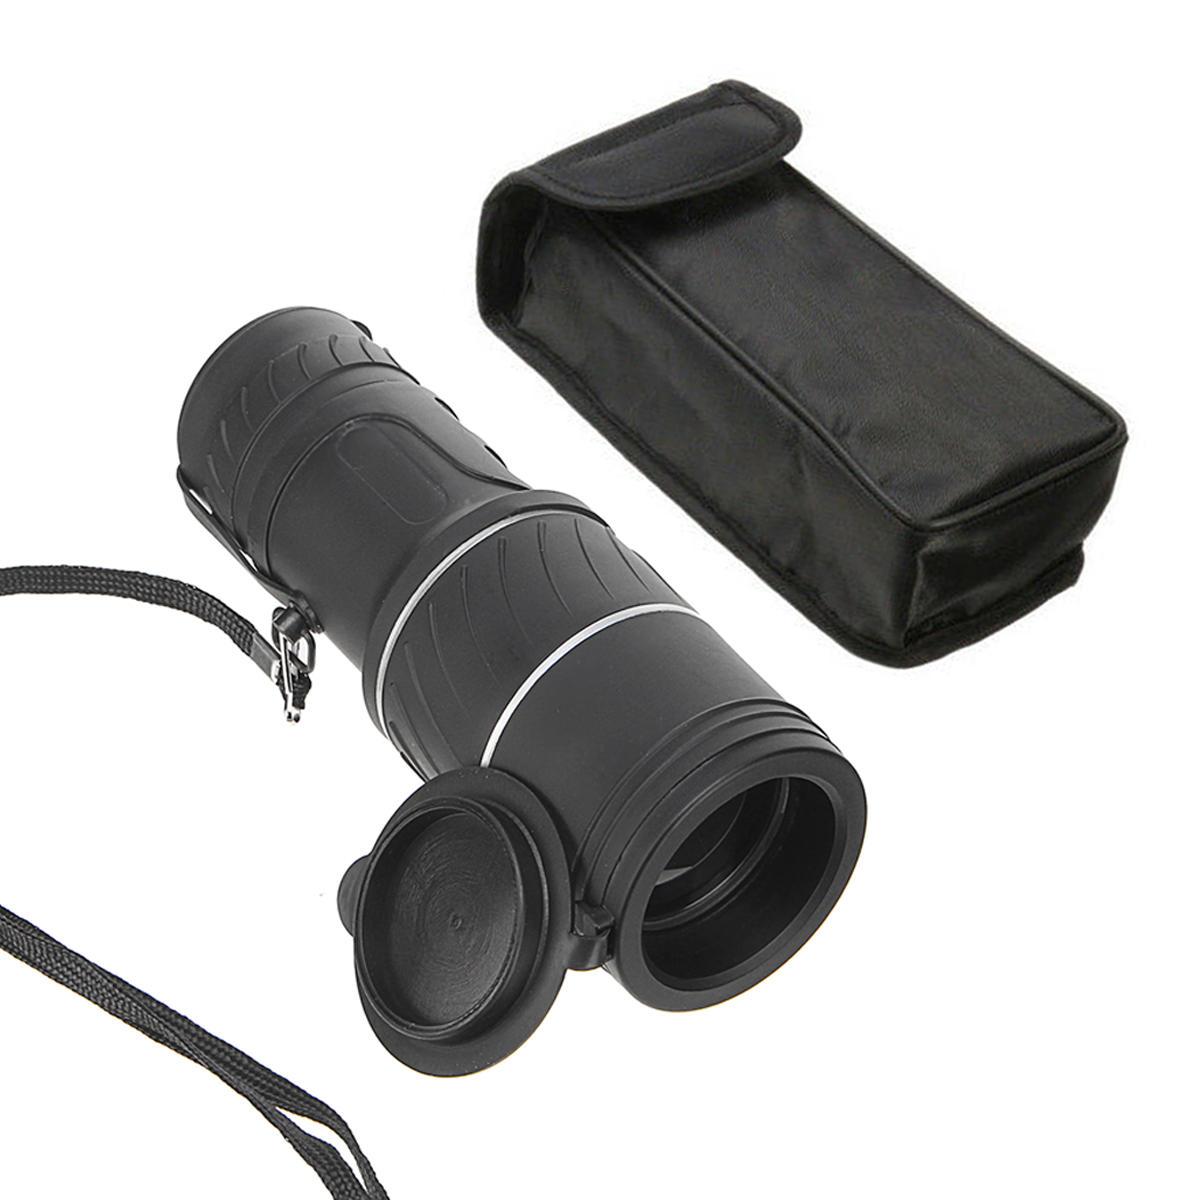 Day & Night Vision 30x52 HD Optical Monocular Waterproof Hunting Camping Hiking Telescope